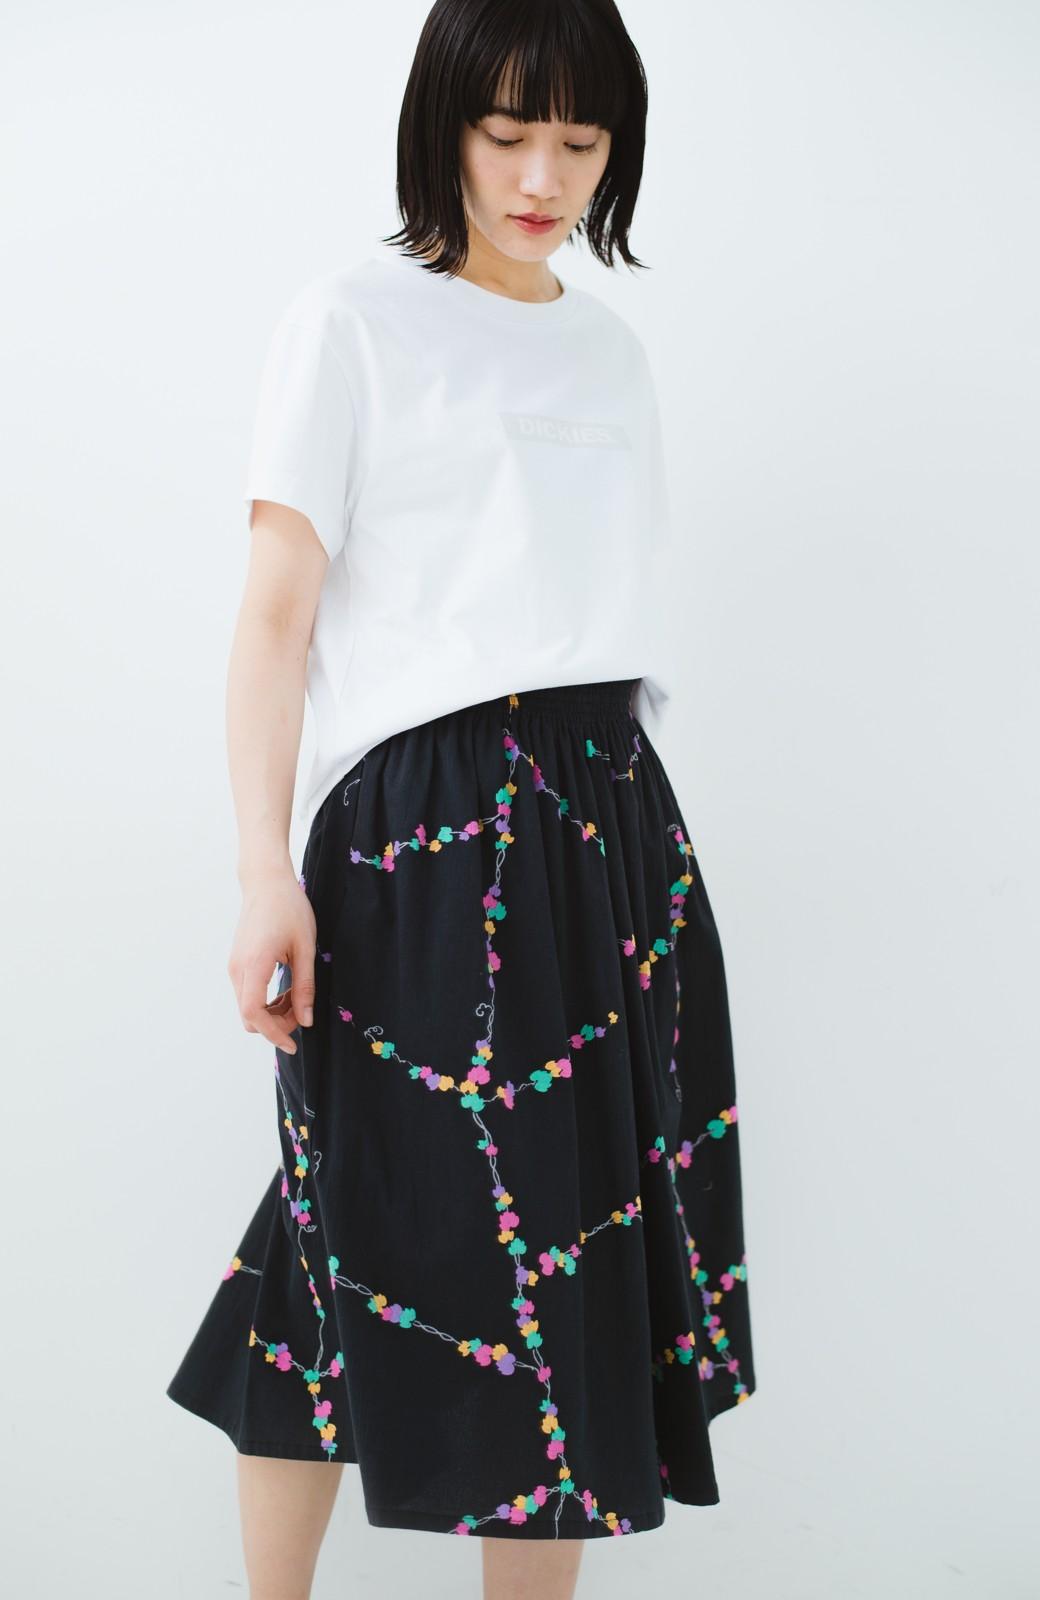 haco! 京都の浴衣屋さんと作った浴衣生地のスカート <ブラック系その他>の商品写真17